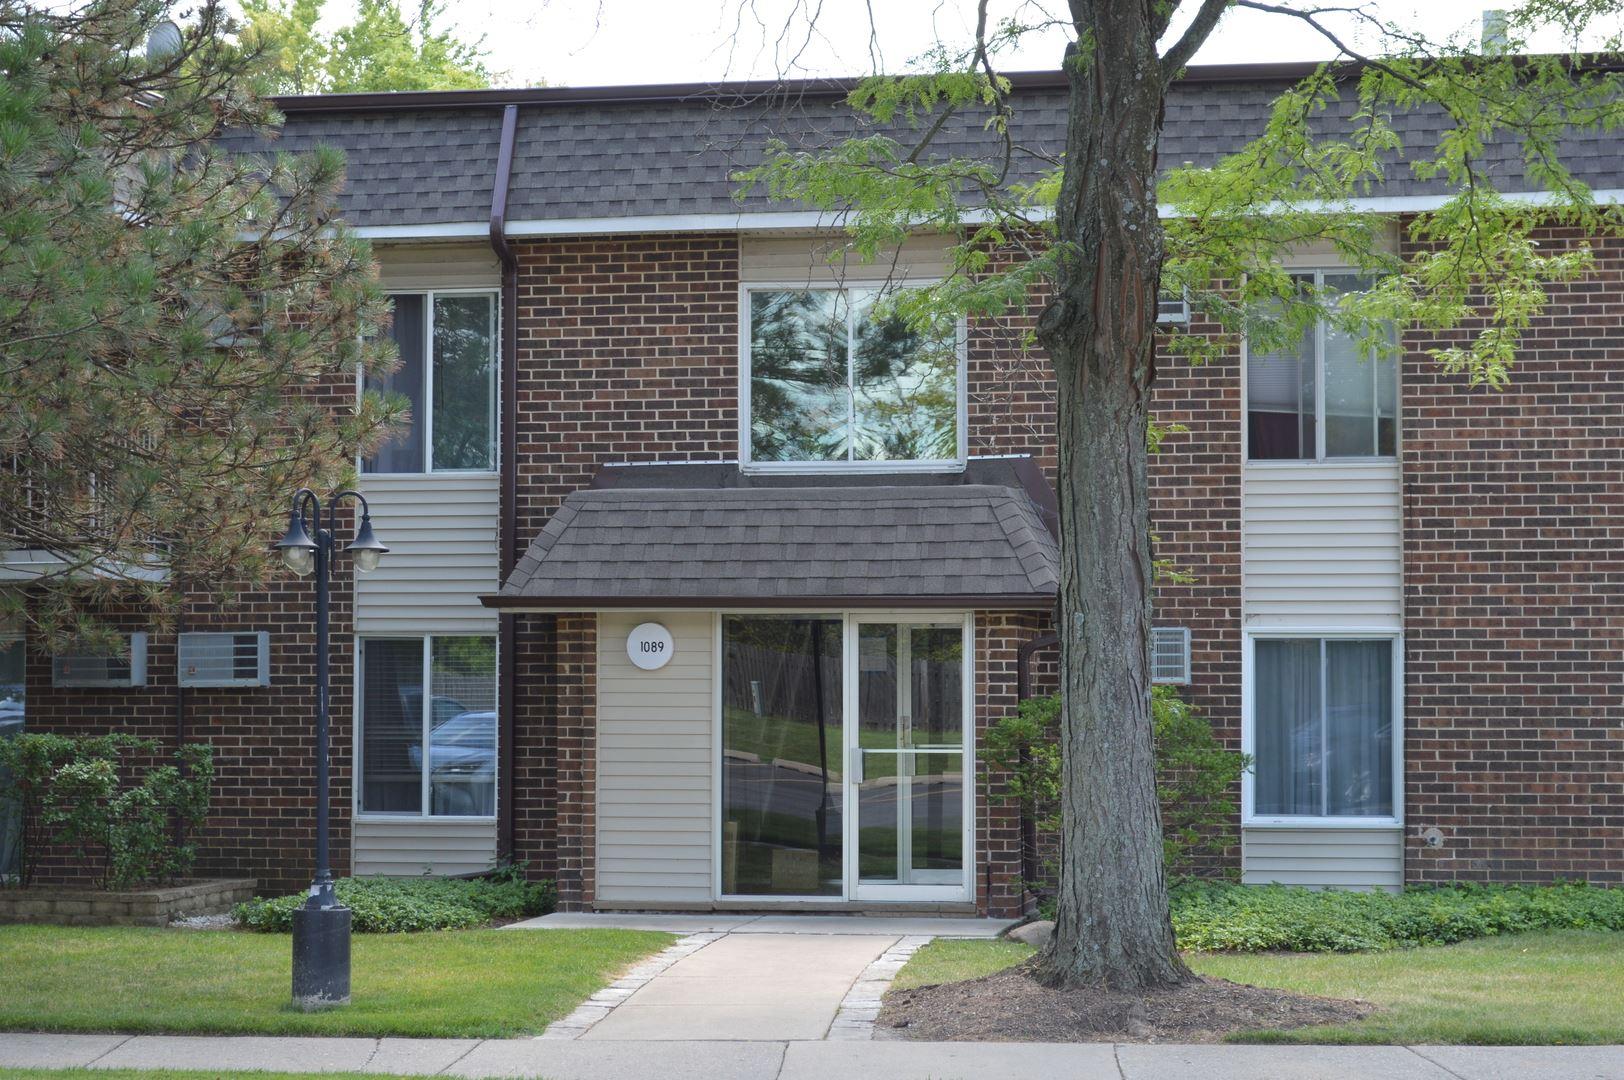 1089 Miller Lane #207, Buffalo Grove, IL 60089 - #: 10794815